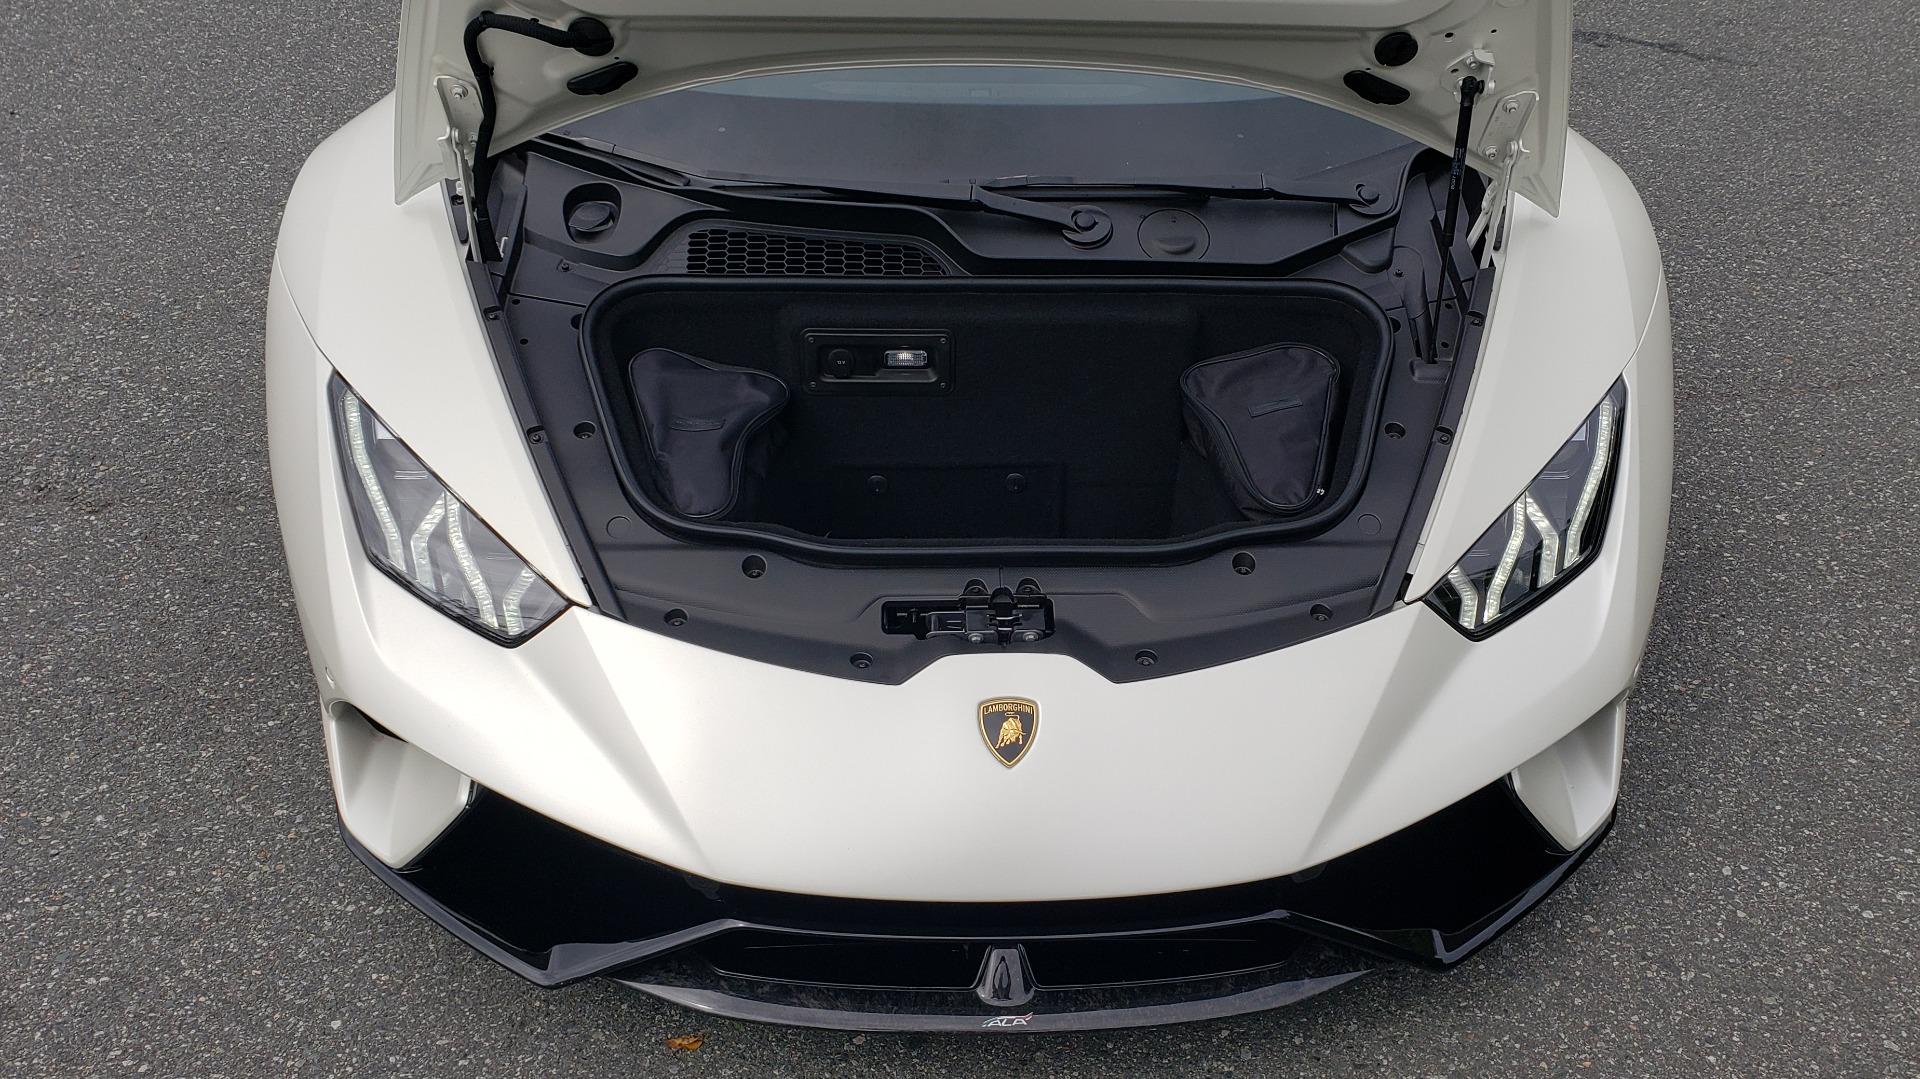 Used 2018 Lamborghini HURACAN PERFORMANTE 5.2L V10 / 630HP / 7-SPD AUTO / AWD / NAV / PREM SND for sale $269,995 at Formula Imports in Charlotte NC 28227 13